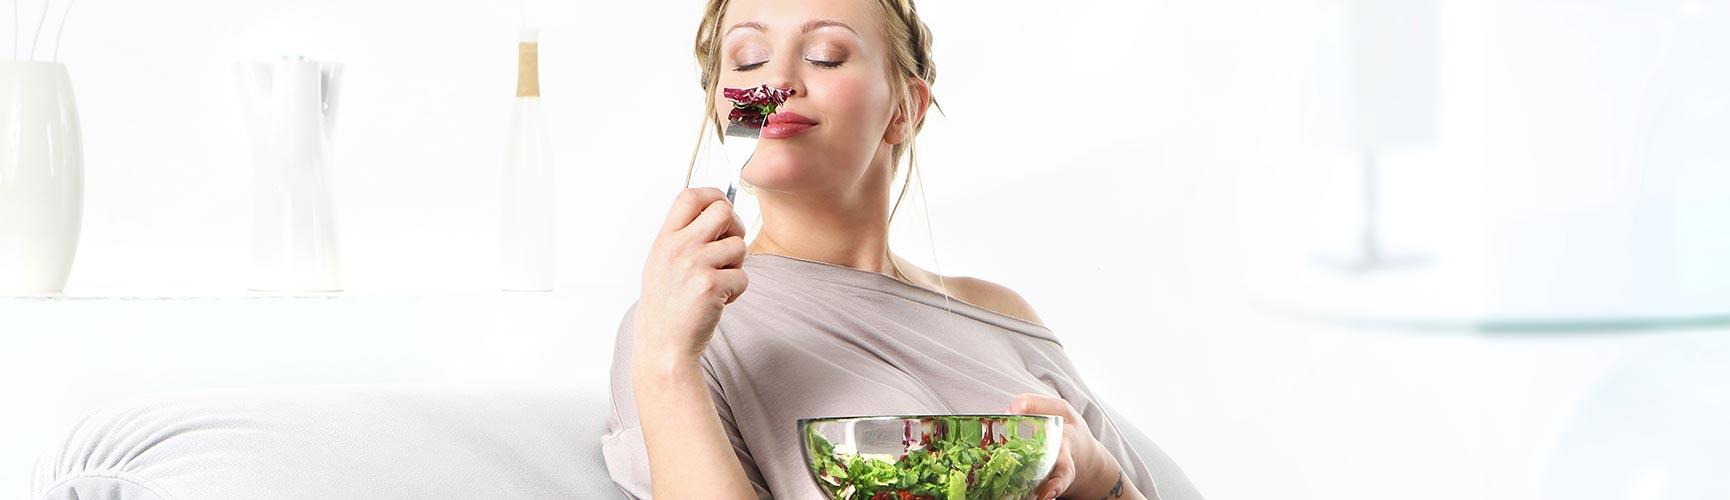 Dieta w endometriozie